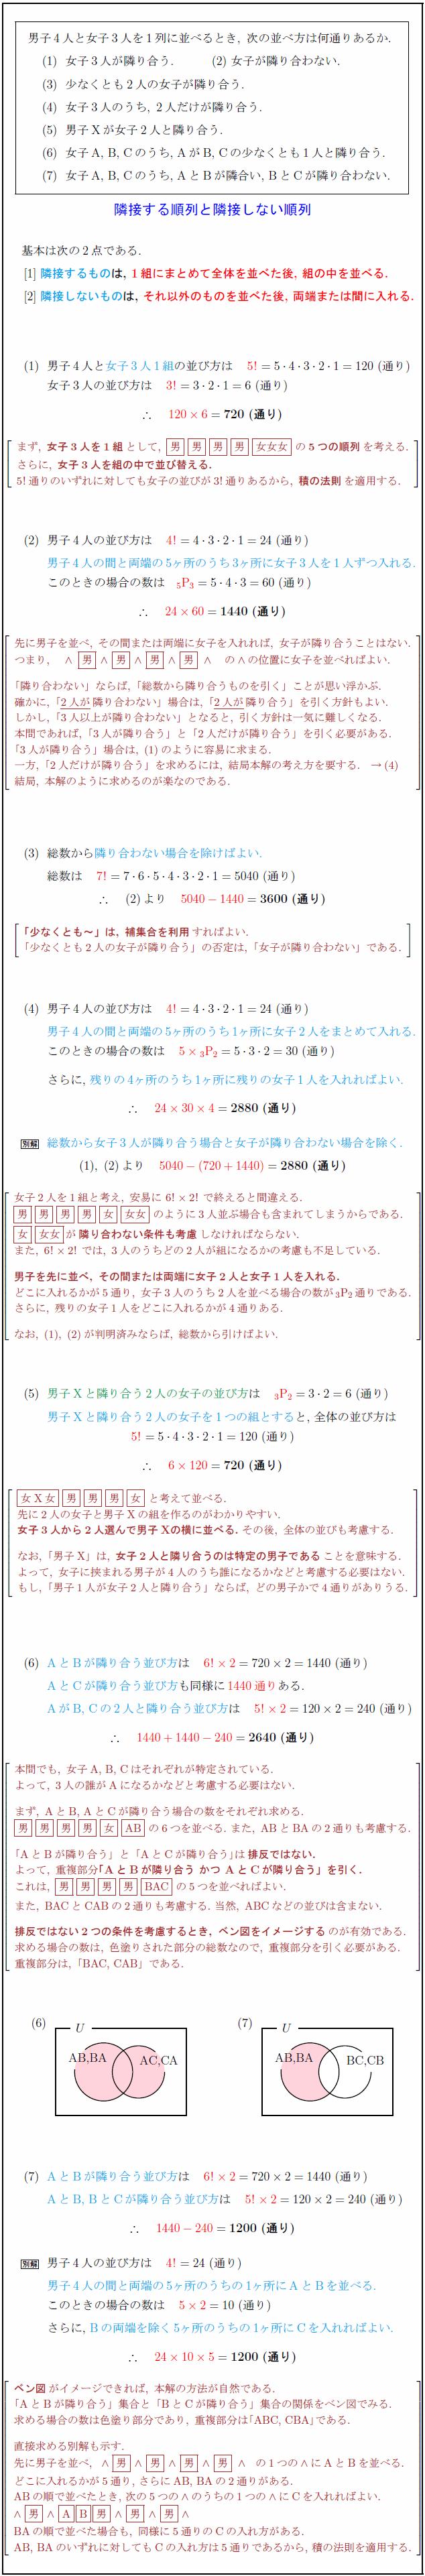 adjacent-permutation